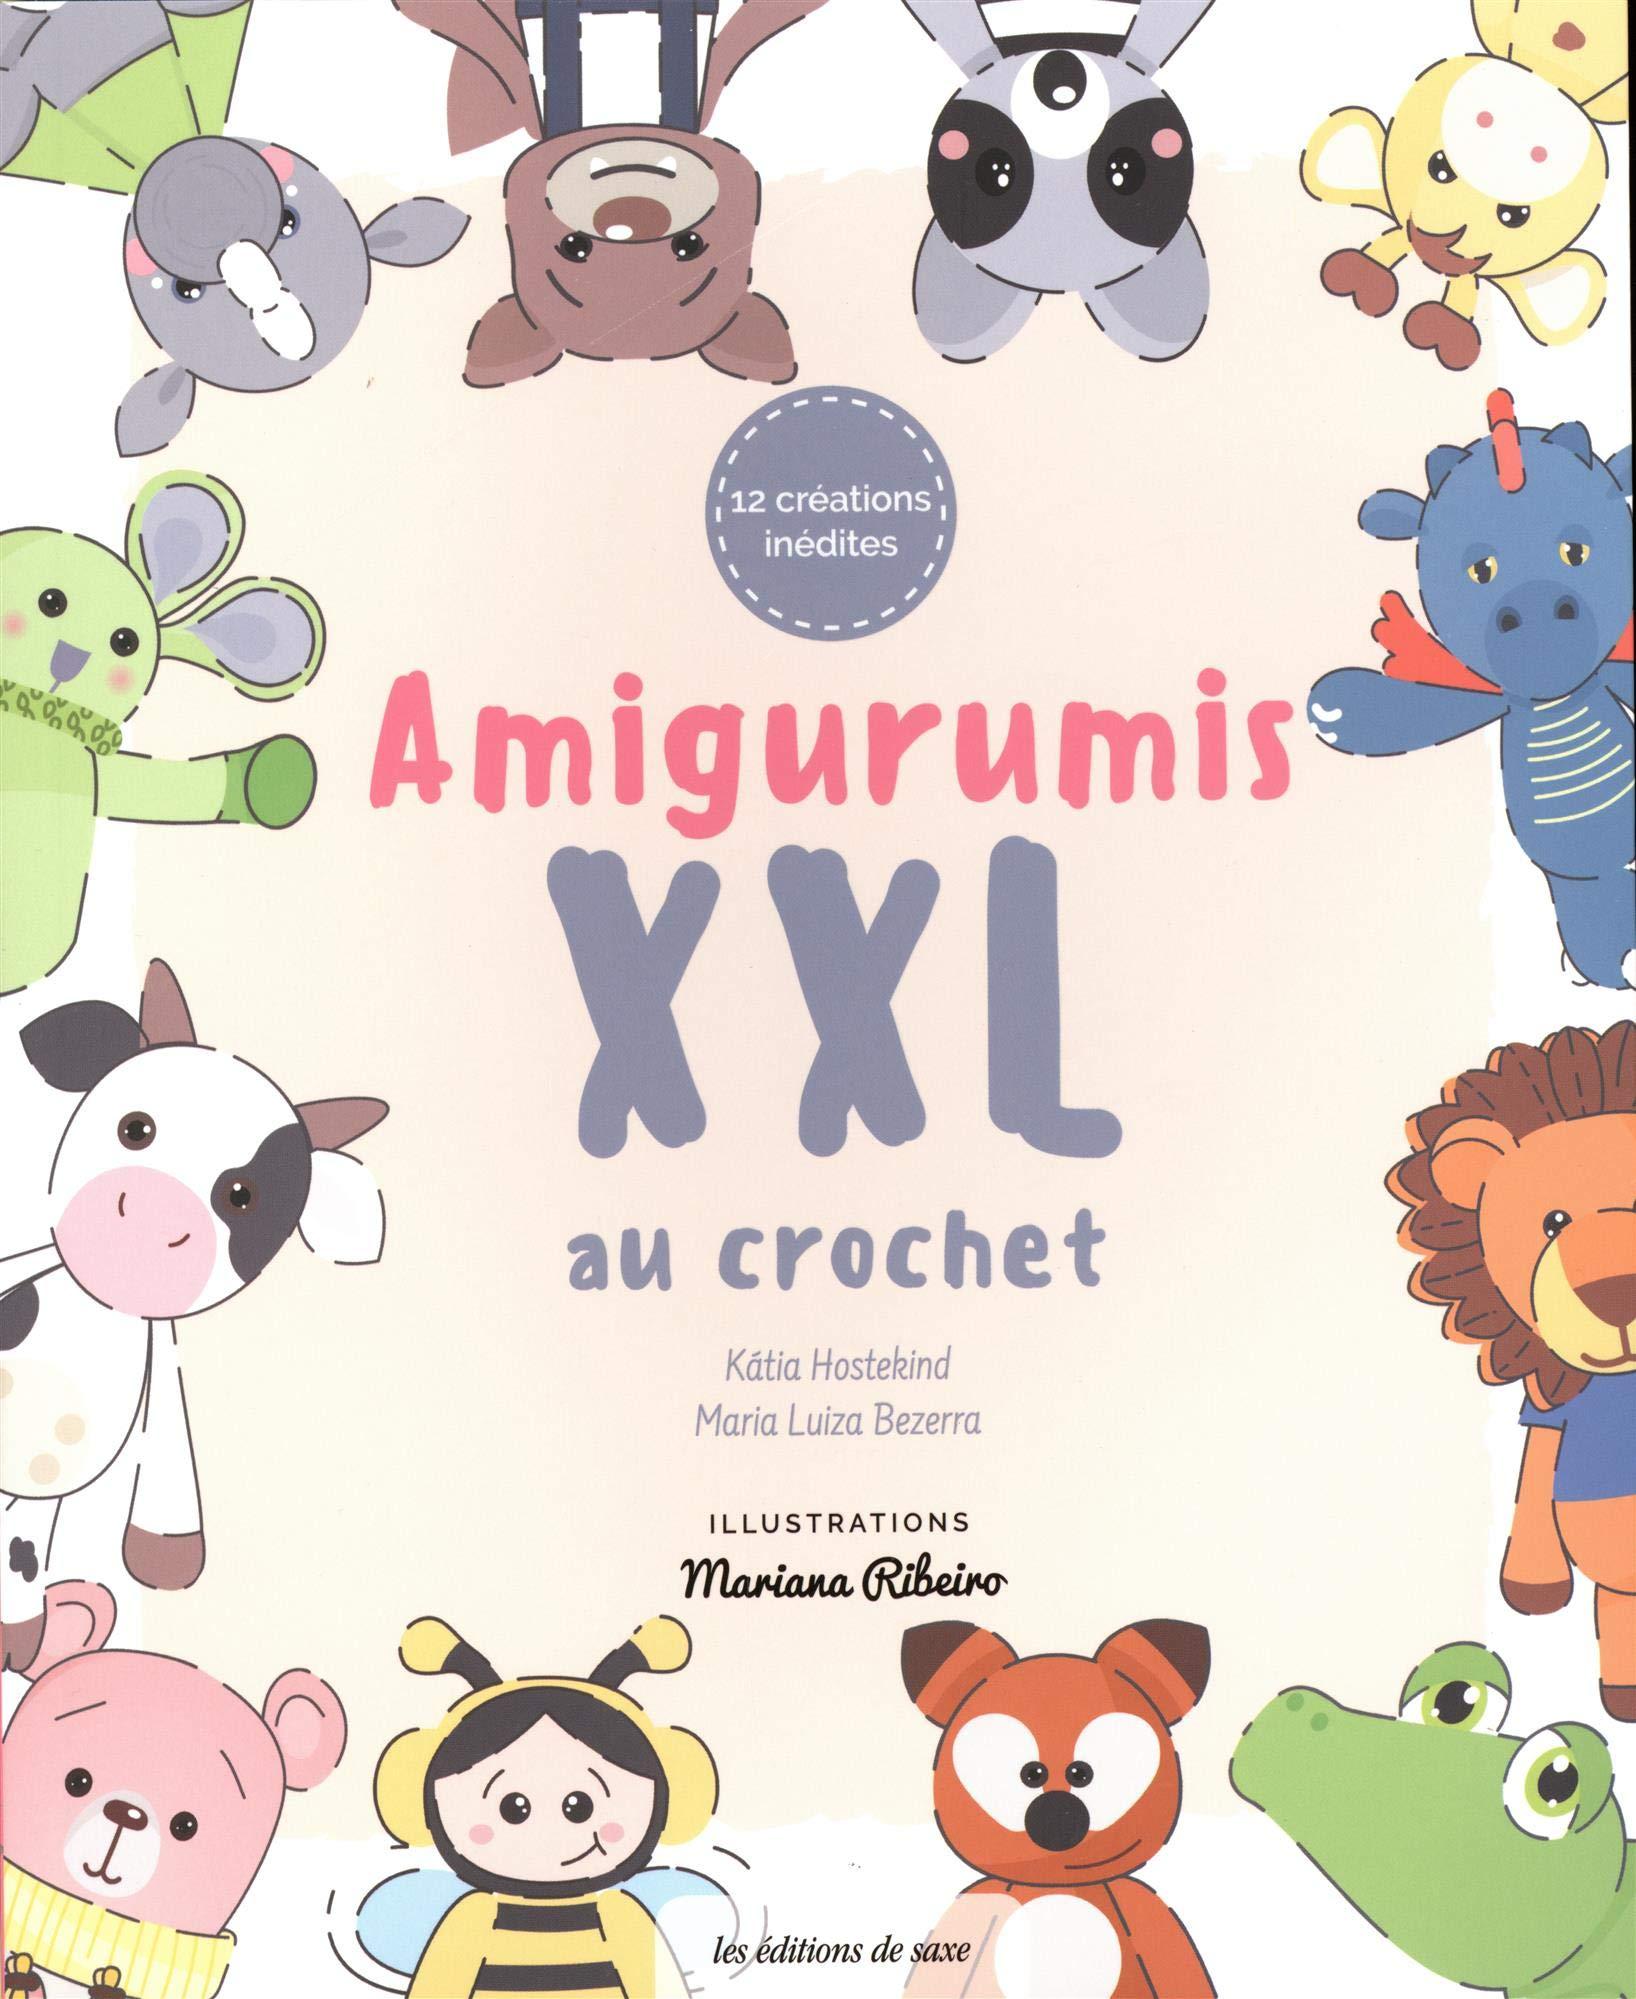 Crochet Amigurumi Patched Tiny Dog (Padrão Livre) - Crochet.msa ... | 1999x1636